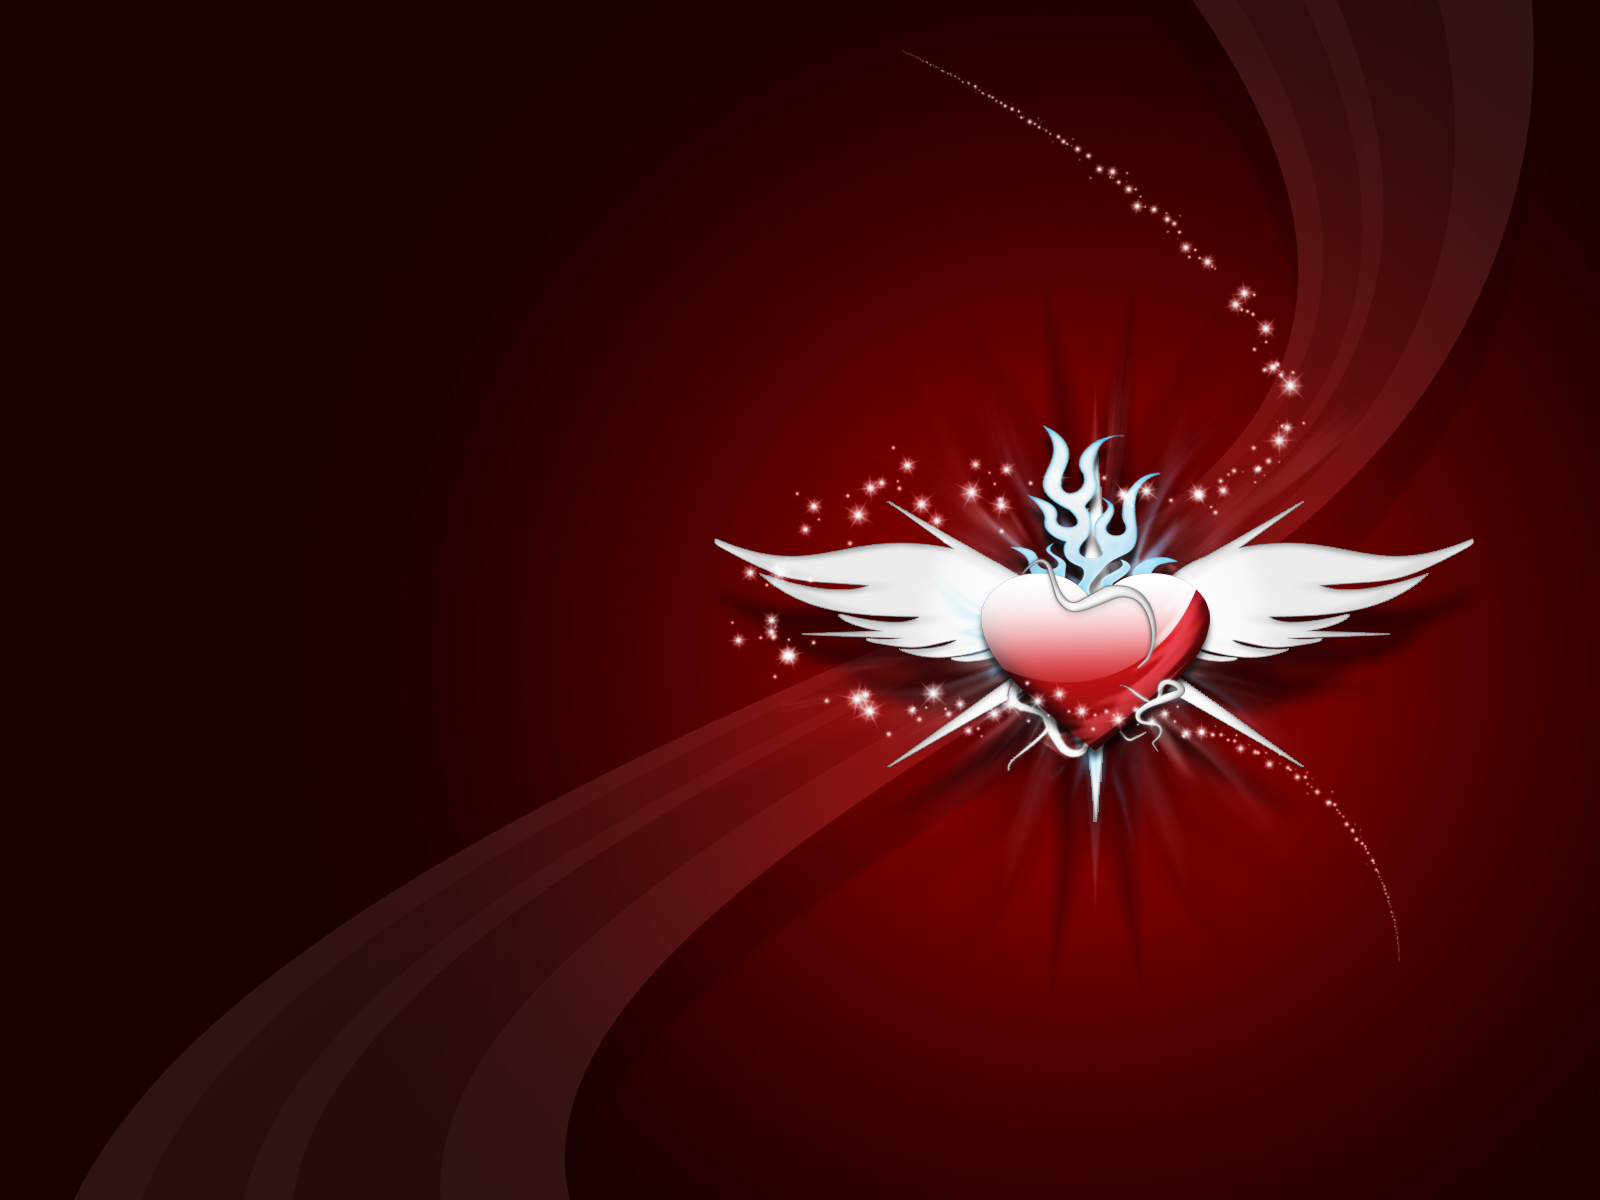 Love Wings Wallpaper, Free Pc Wallpaper